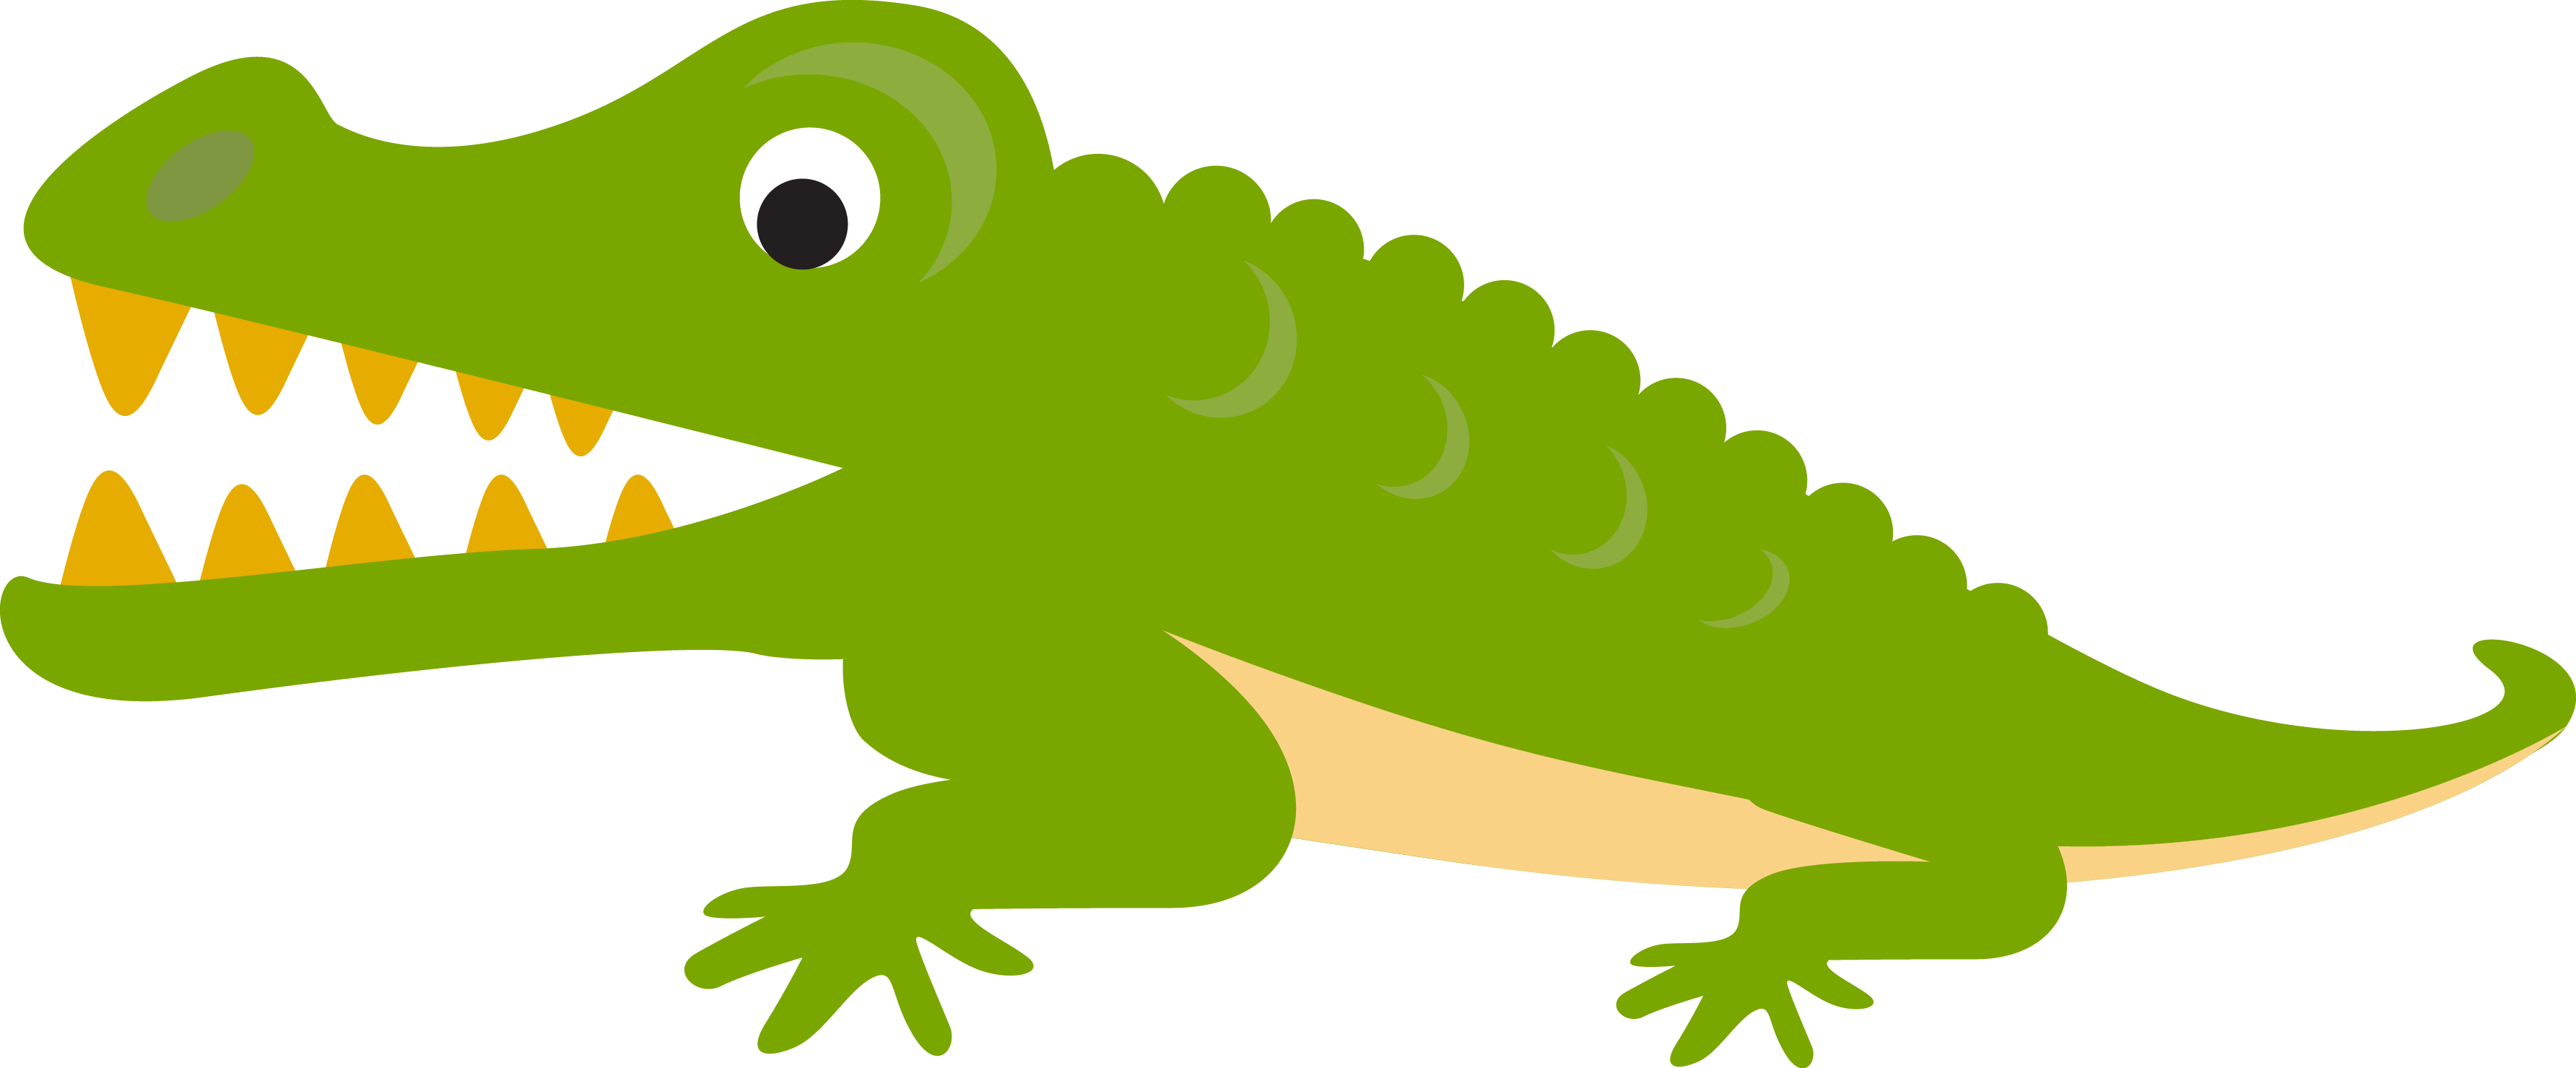 Alligator Crocodile Cartoon Illustration - Crocodile Cartoon Png (3568x1479)